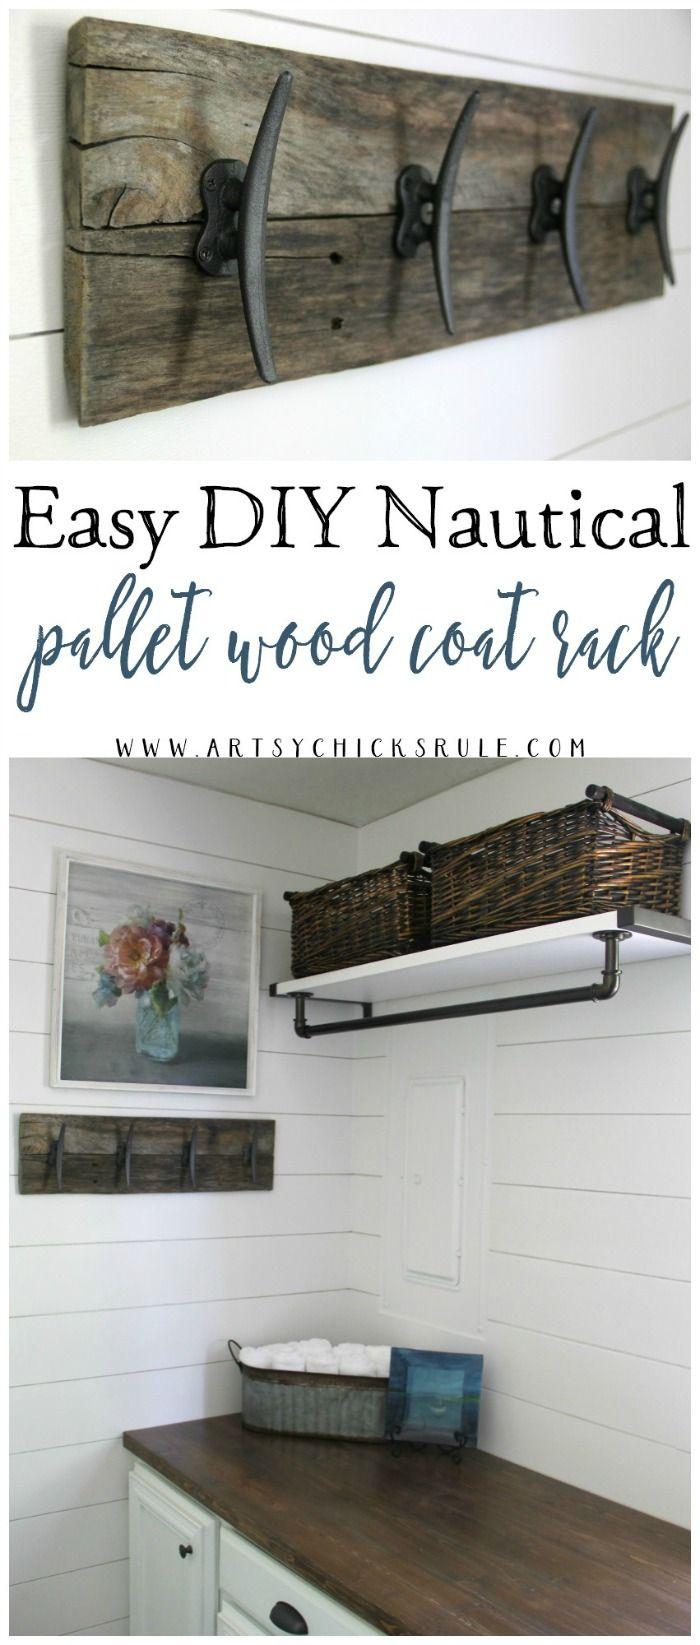 Easy Diy Nautical Pallet Wood Coat Rack Simple Project Nautical Diy Pallet Wood Shelves Wood Pallet Projects